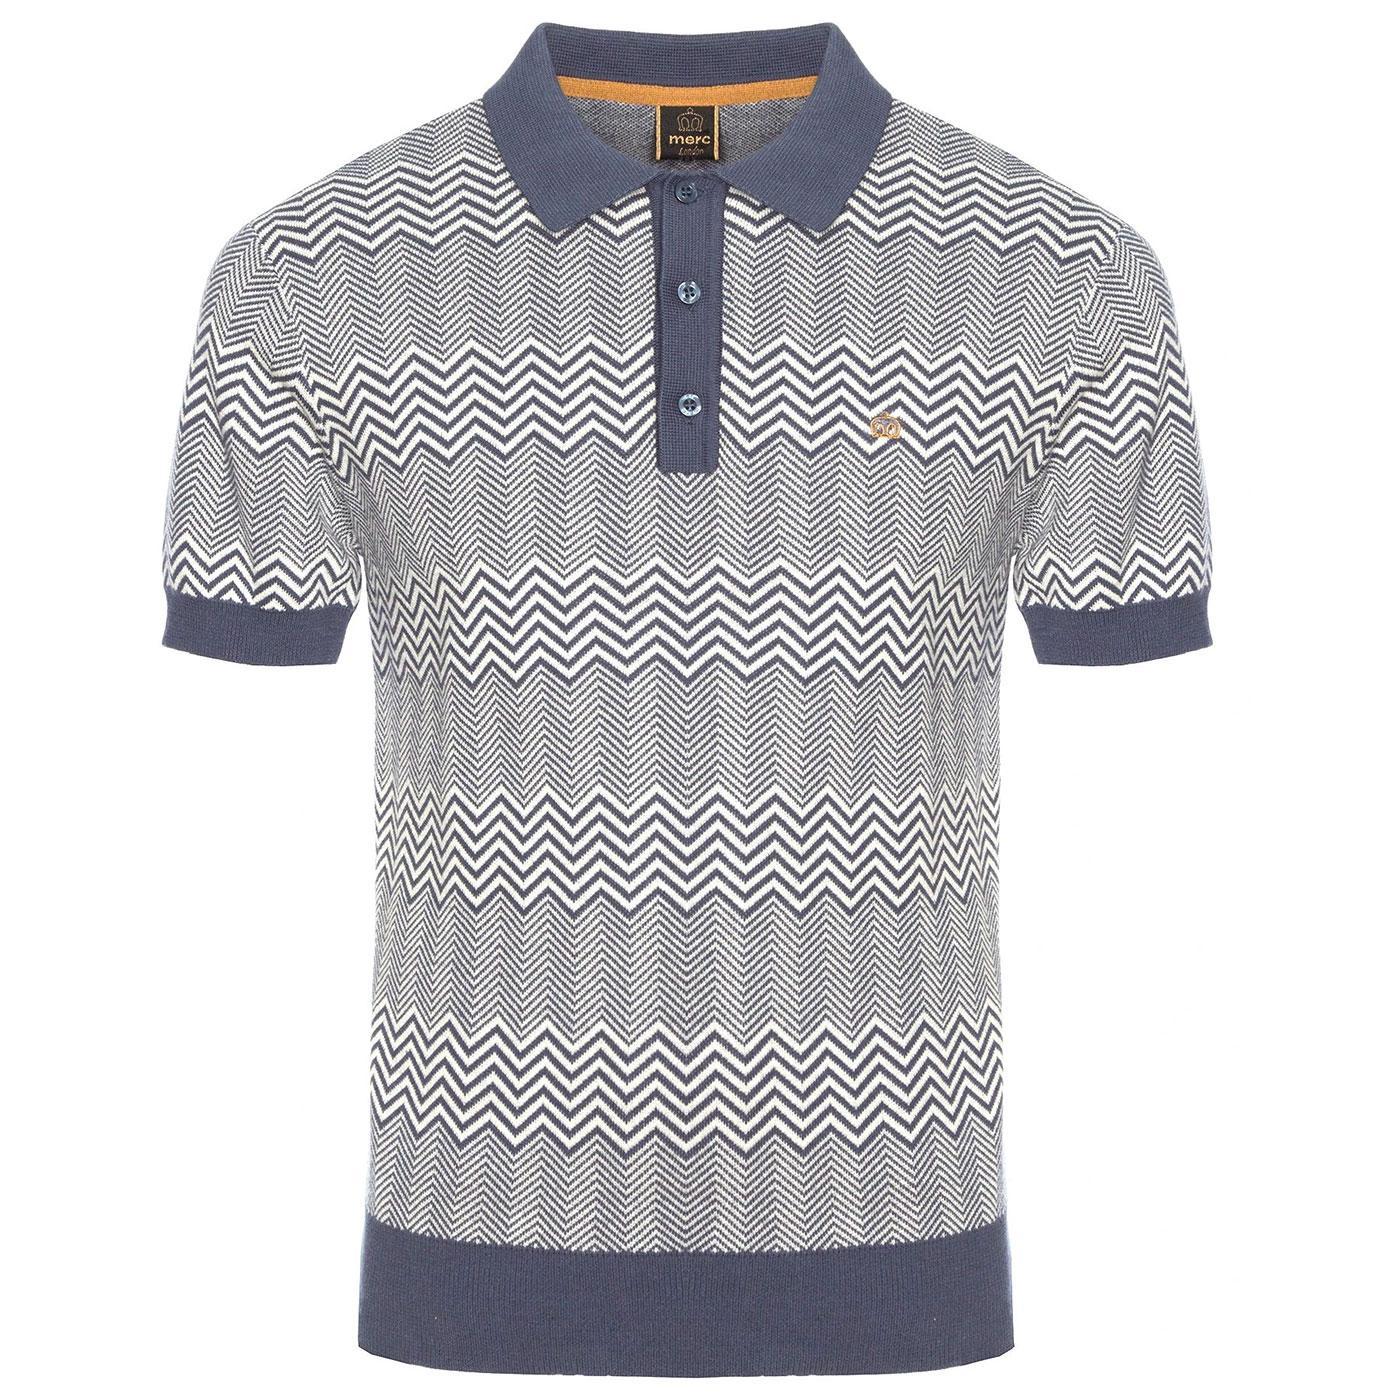 Bennard MERC Retro Mod Knitted Polo in Slate Blue